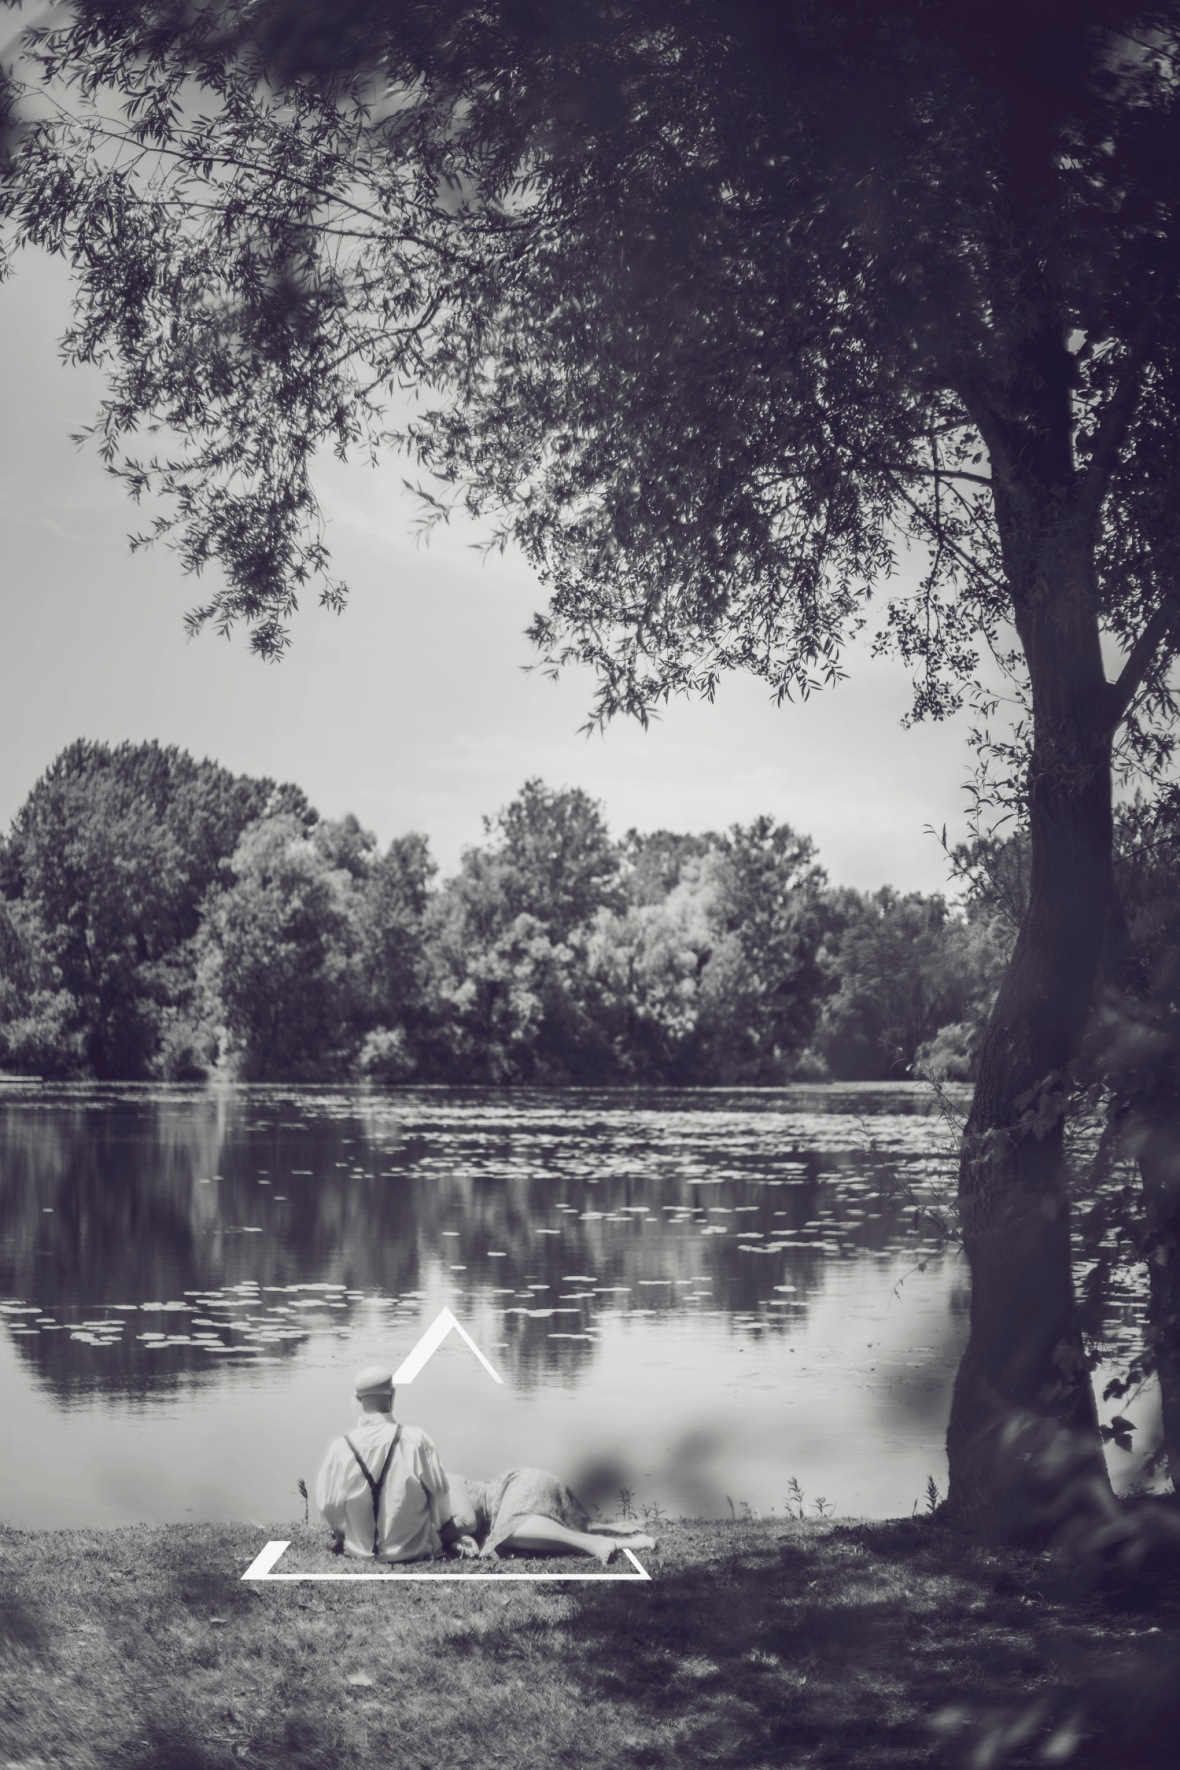 annamoor-photos-lutak